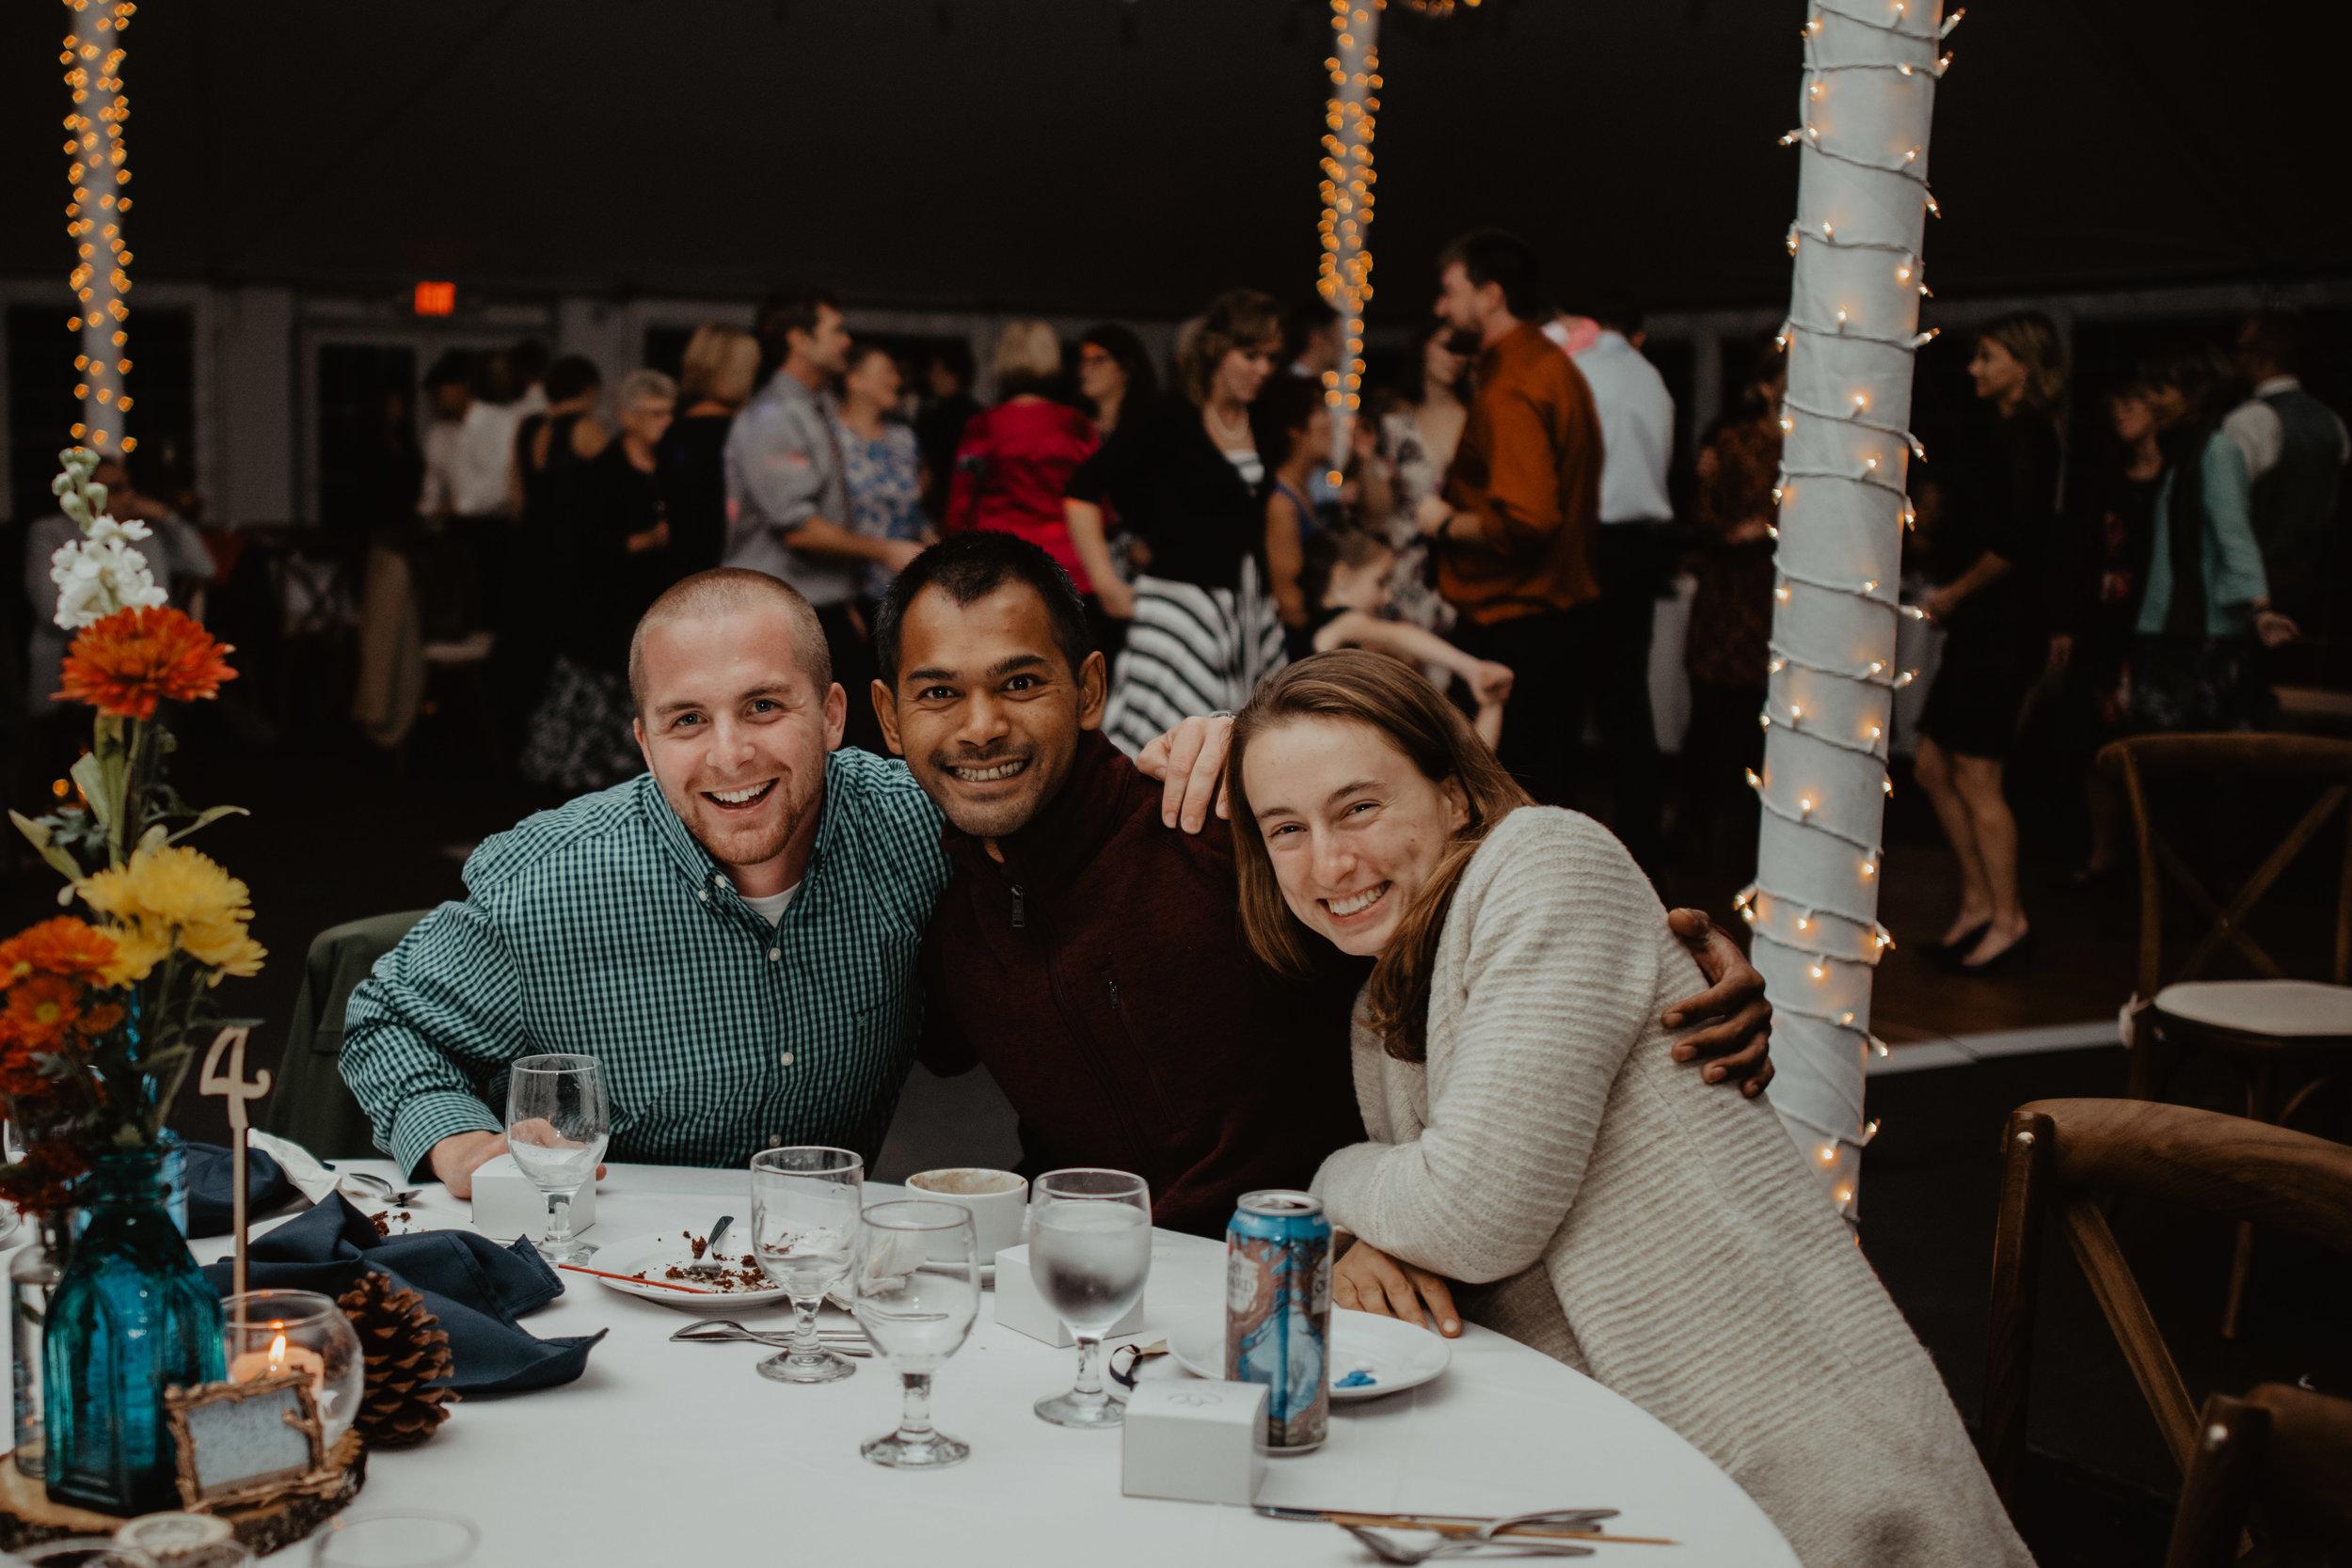 Vermont Wedding | Lorianna Weathers Photography-2018.jpg